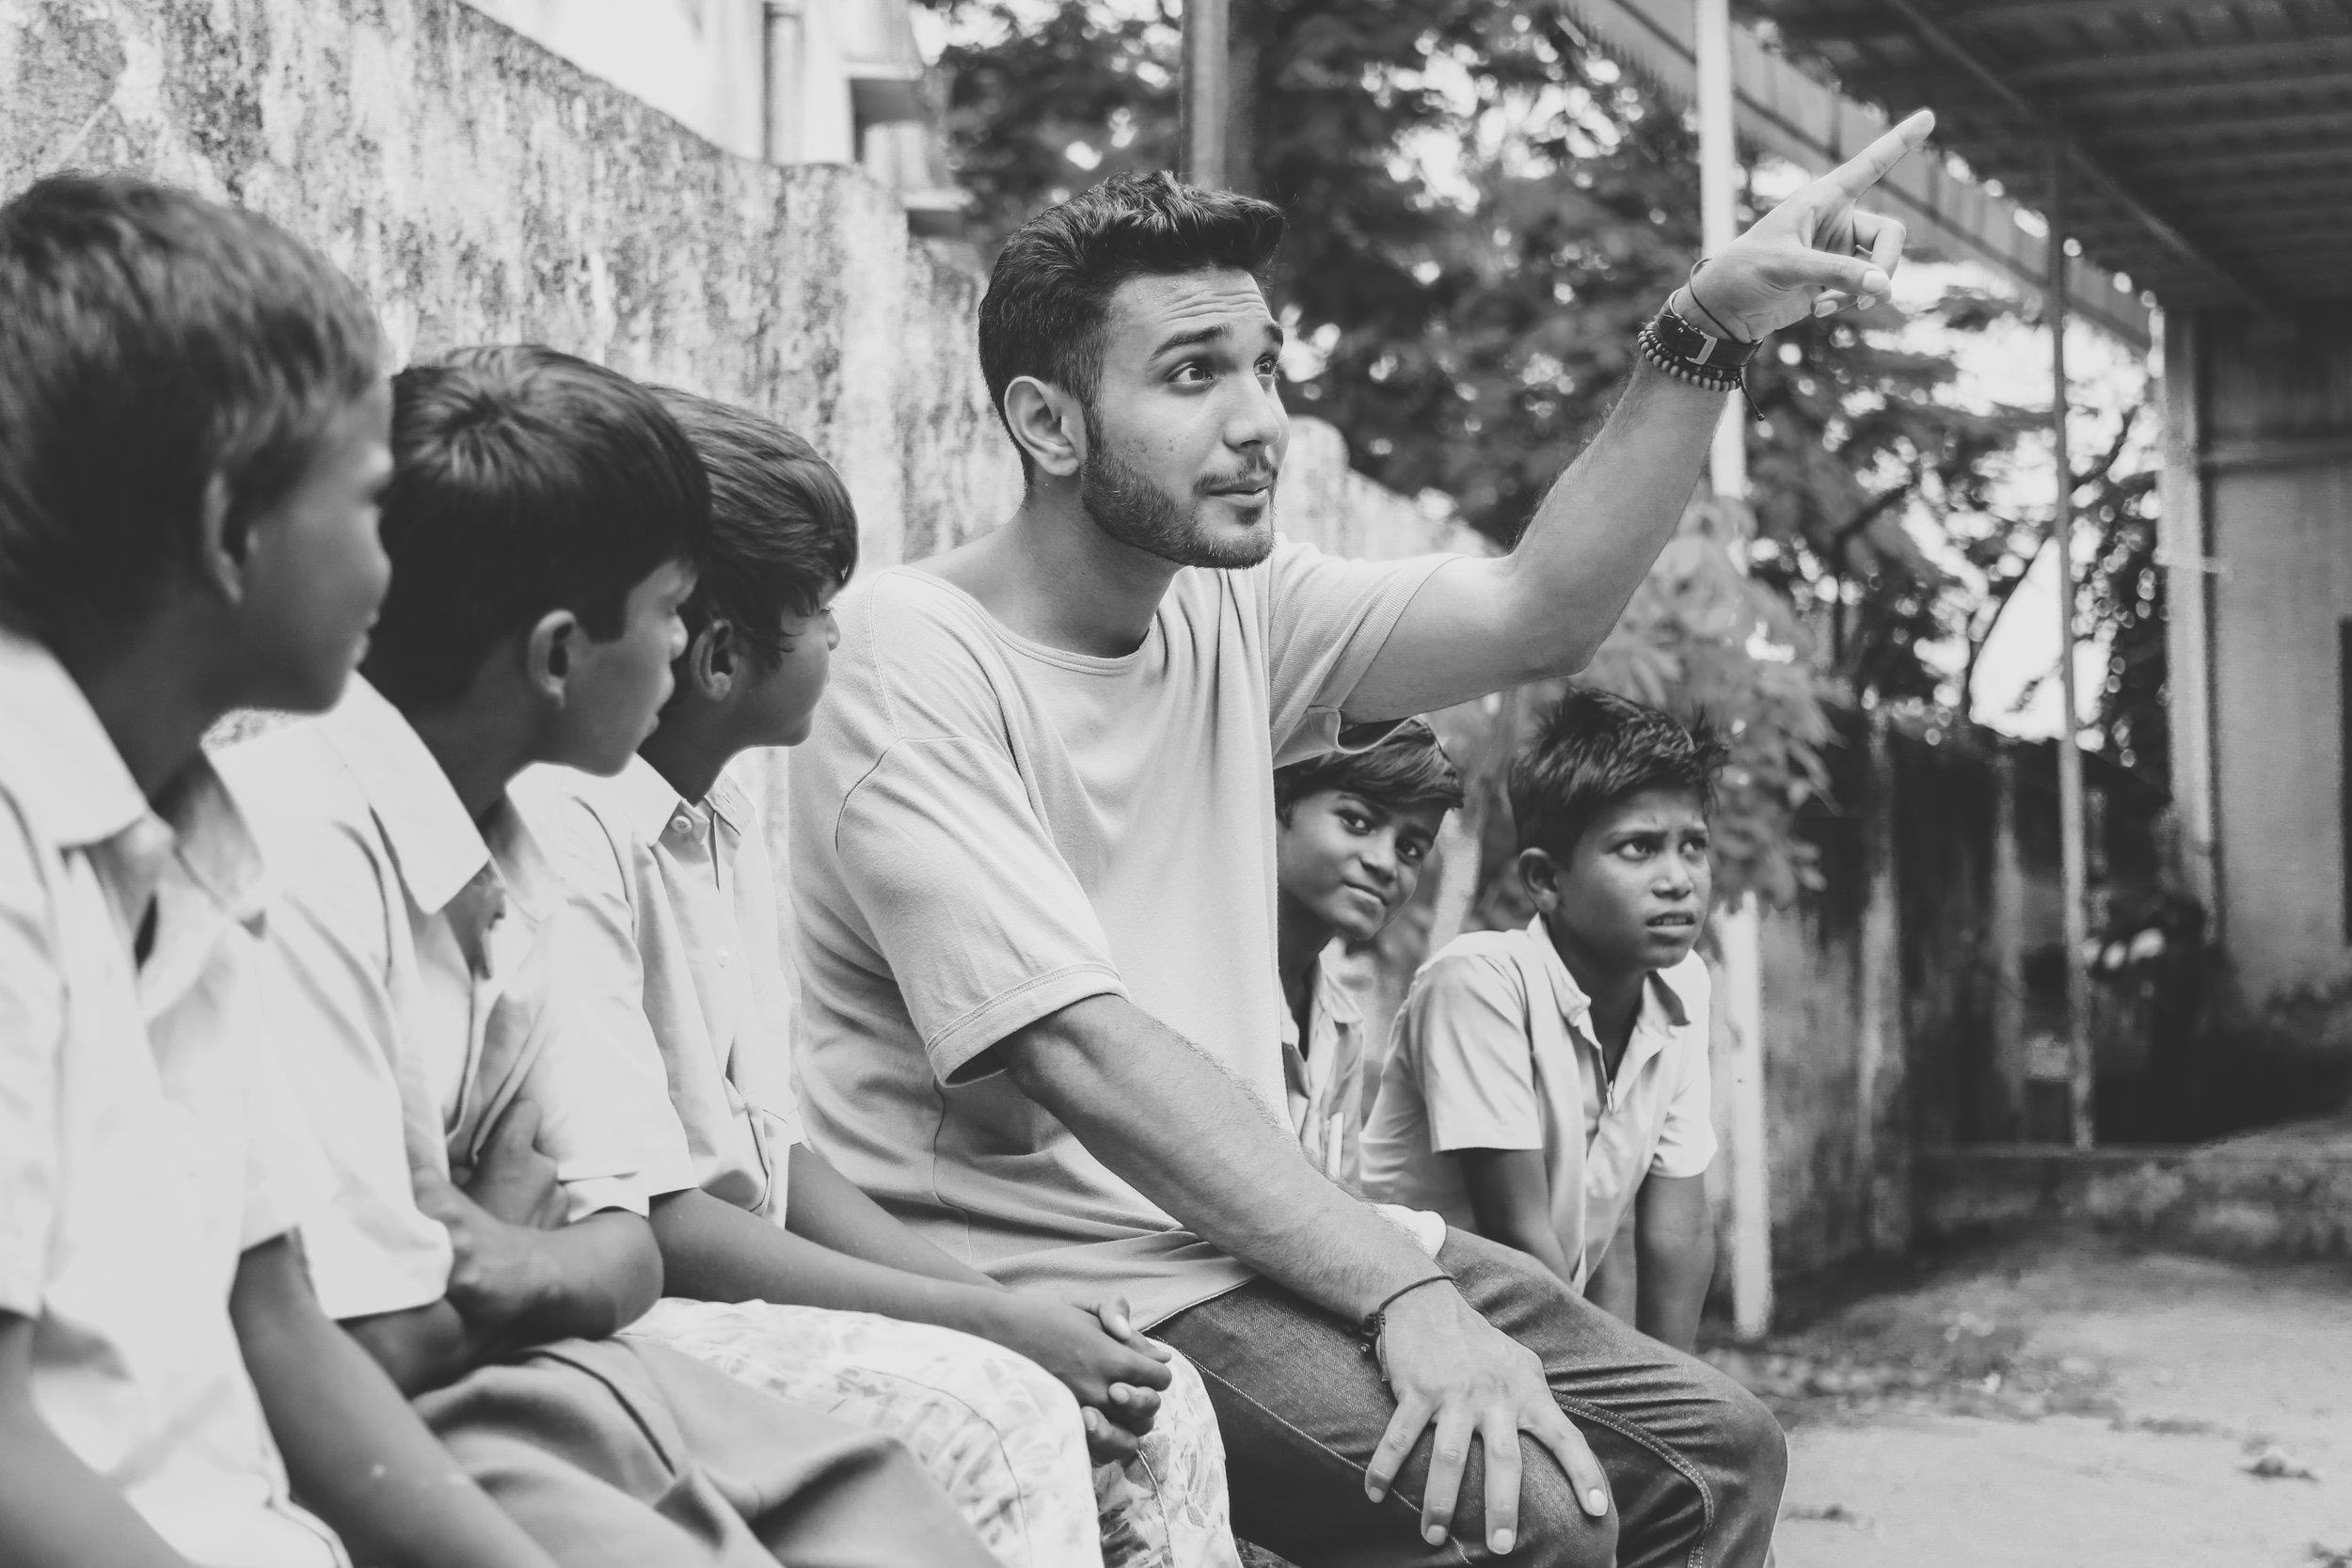 Uplift Humanity Anish Patel